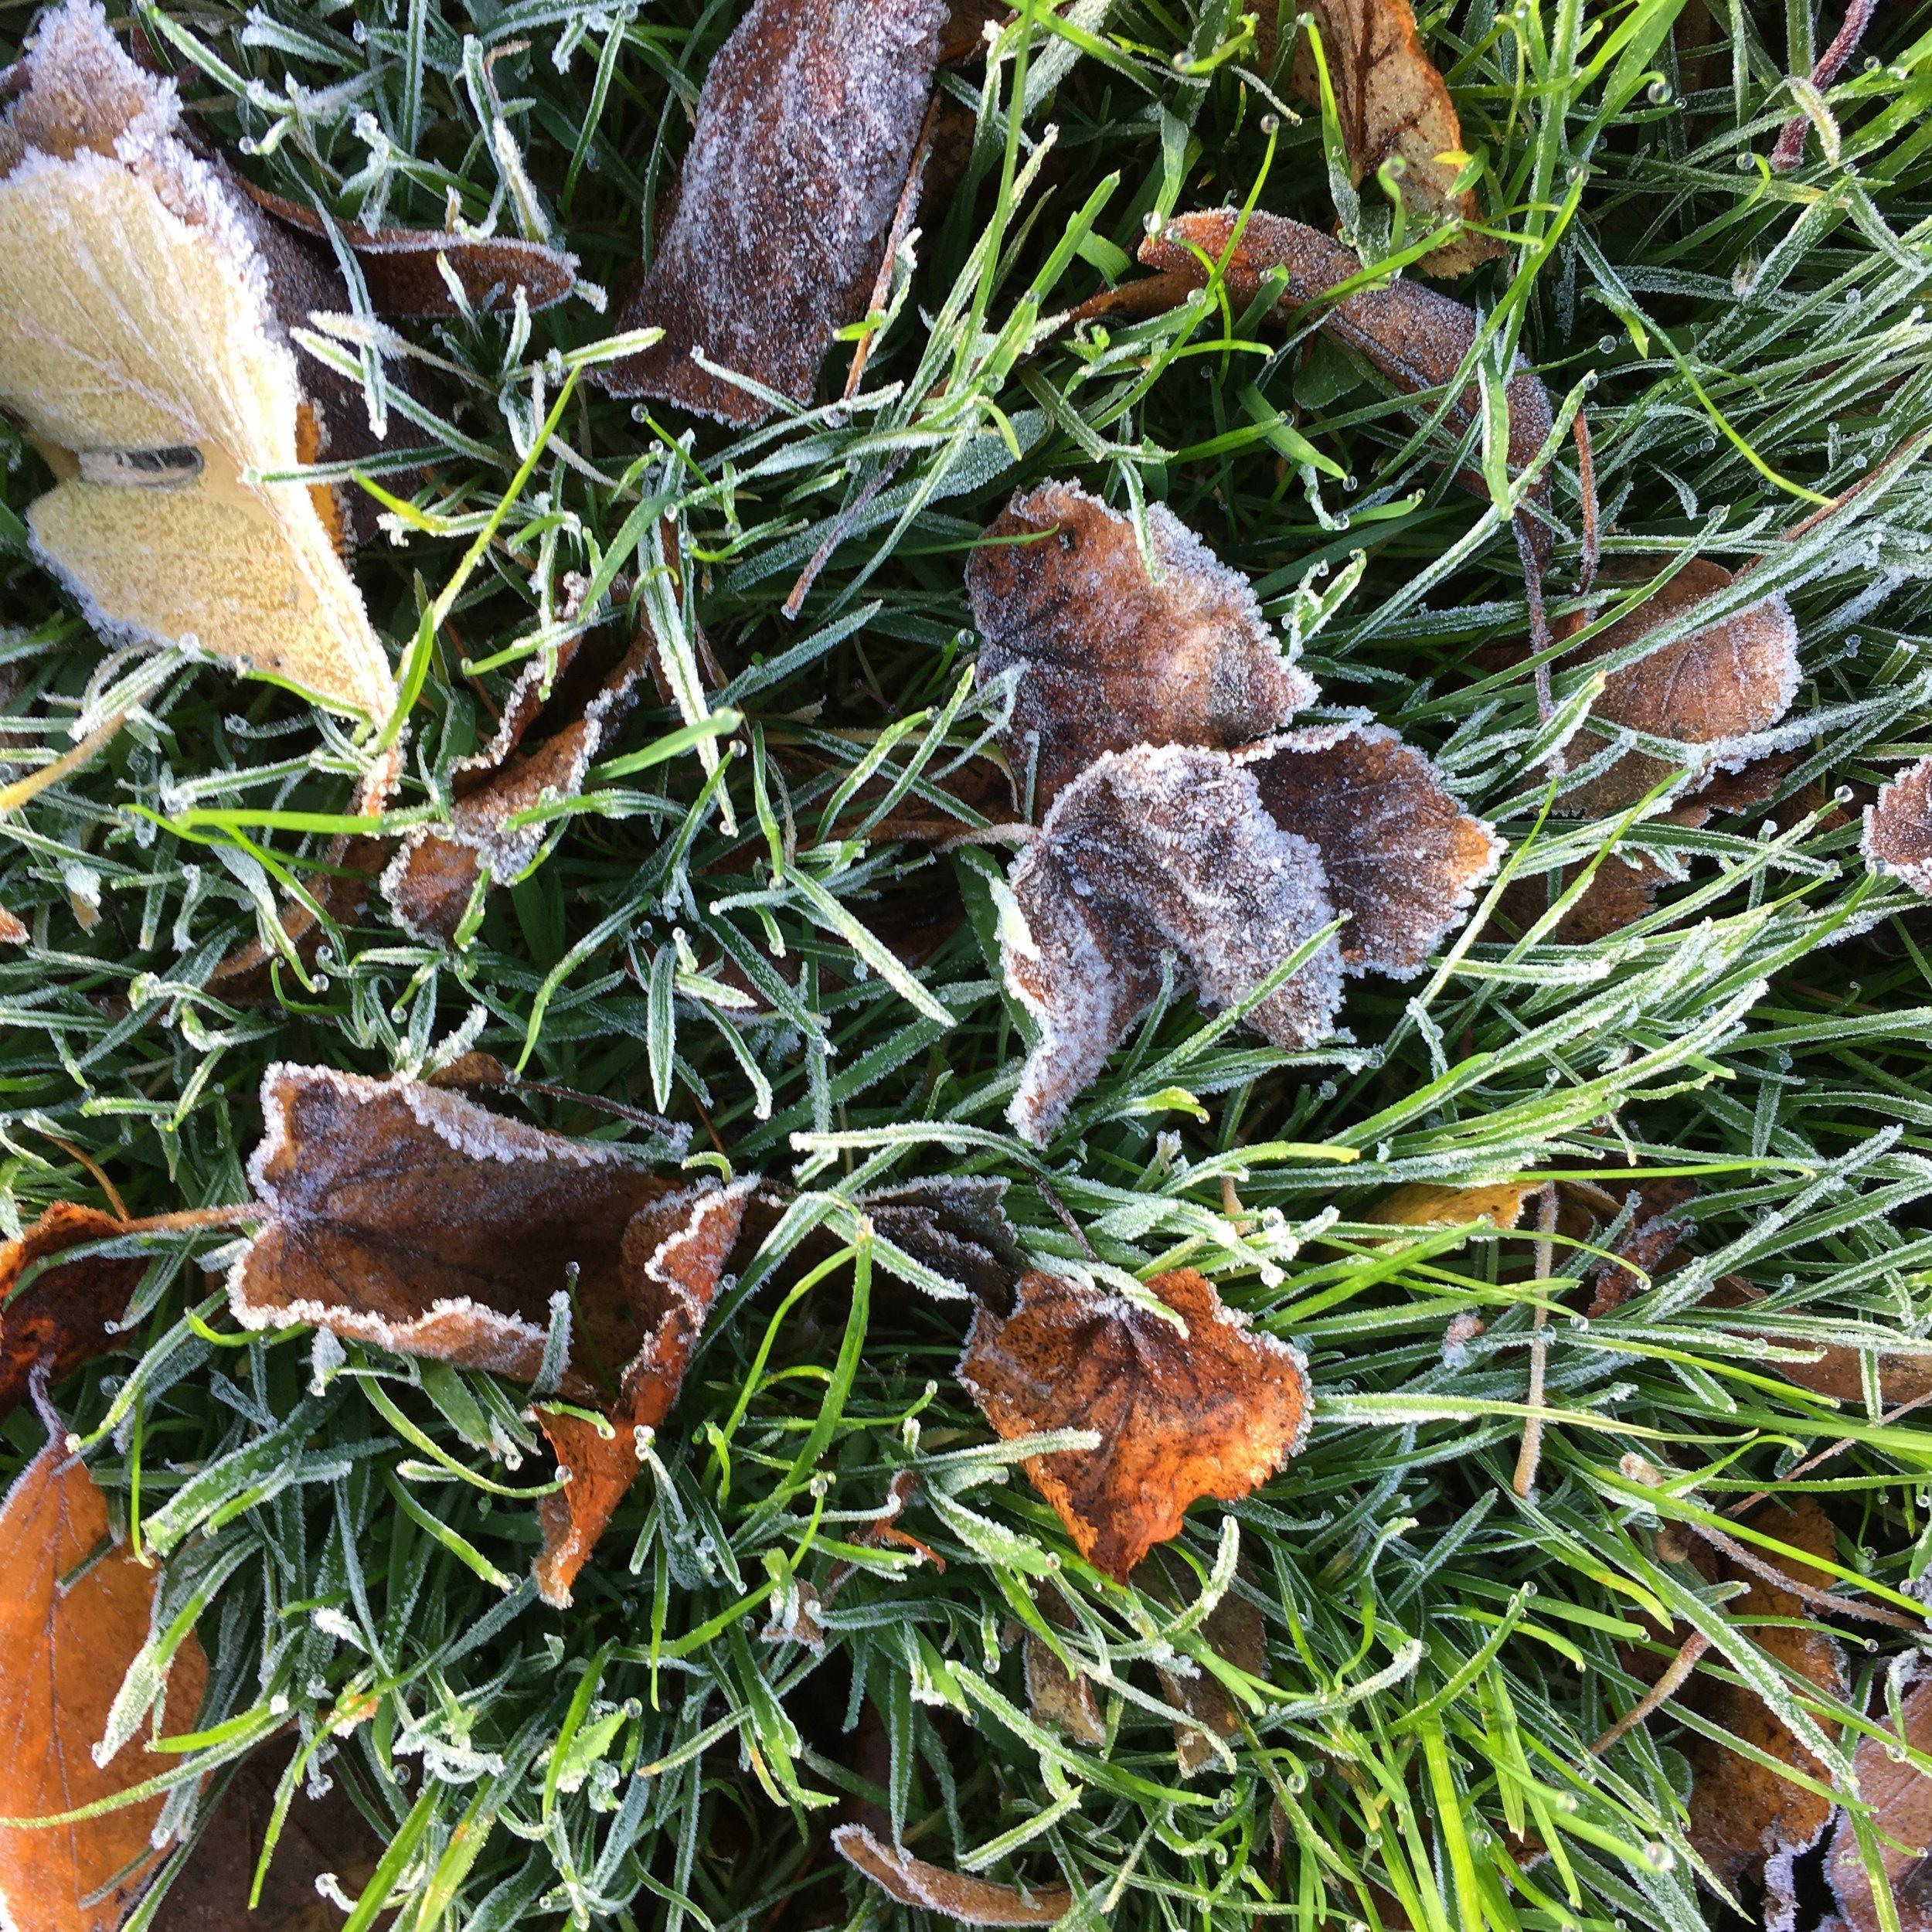 Frozen grass in the first weekend of November